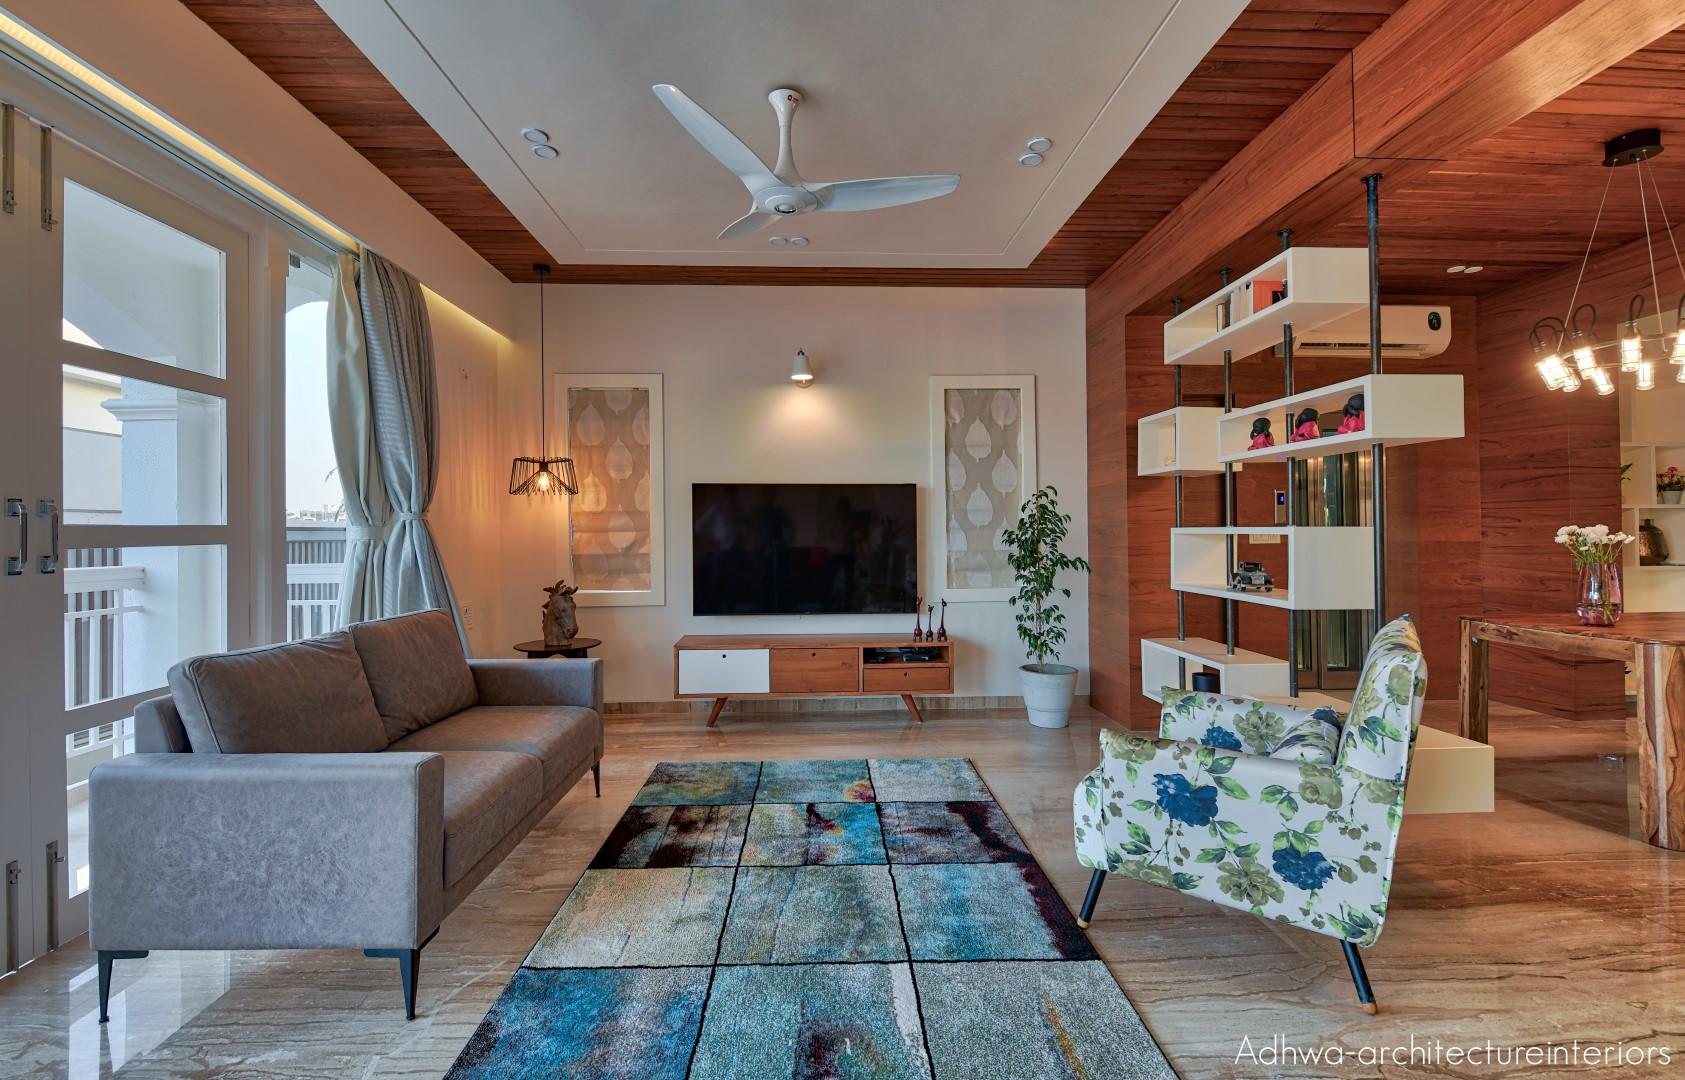 Residence Interior Designer in Dwarka  Home Interior  Traditional Interior